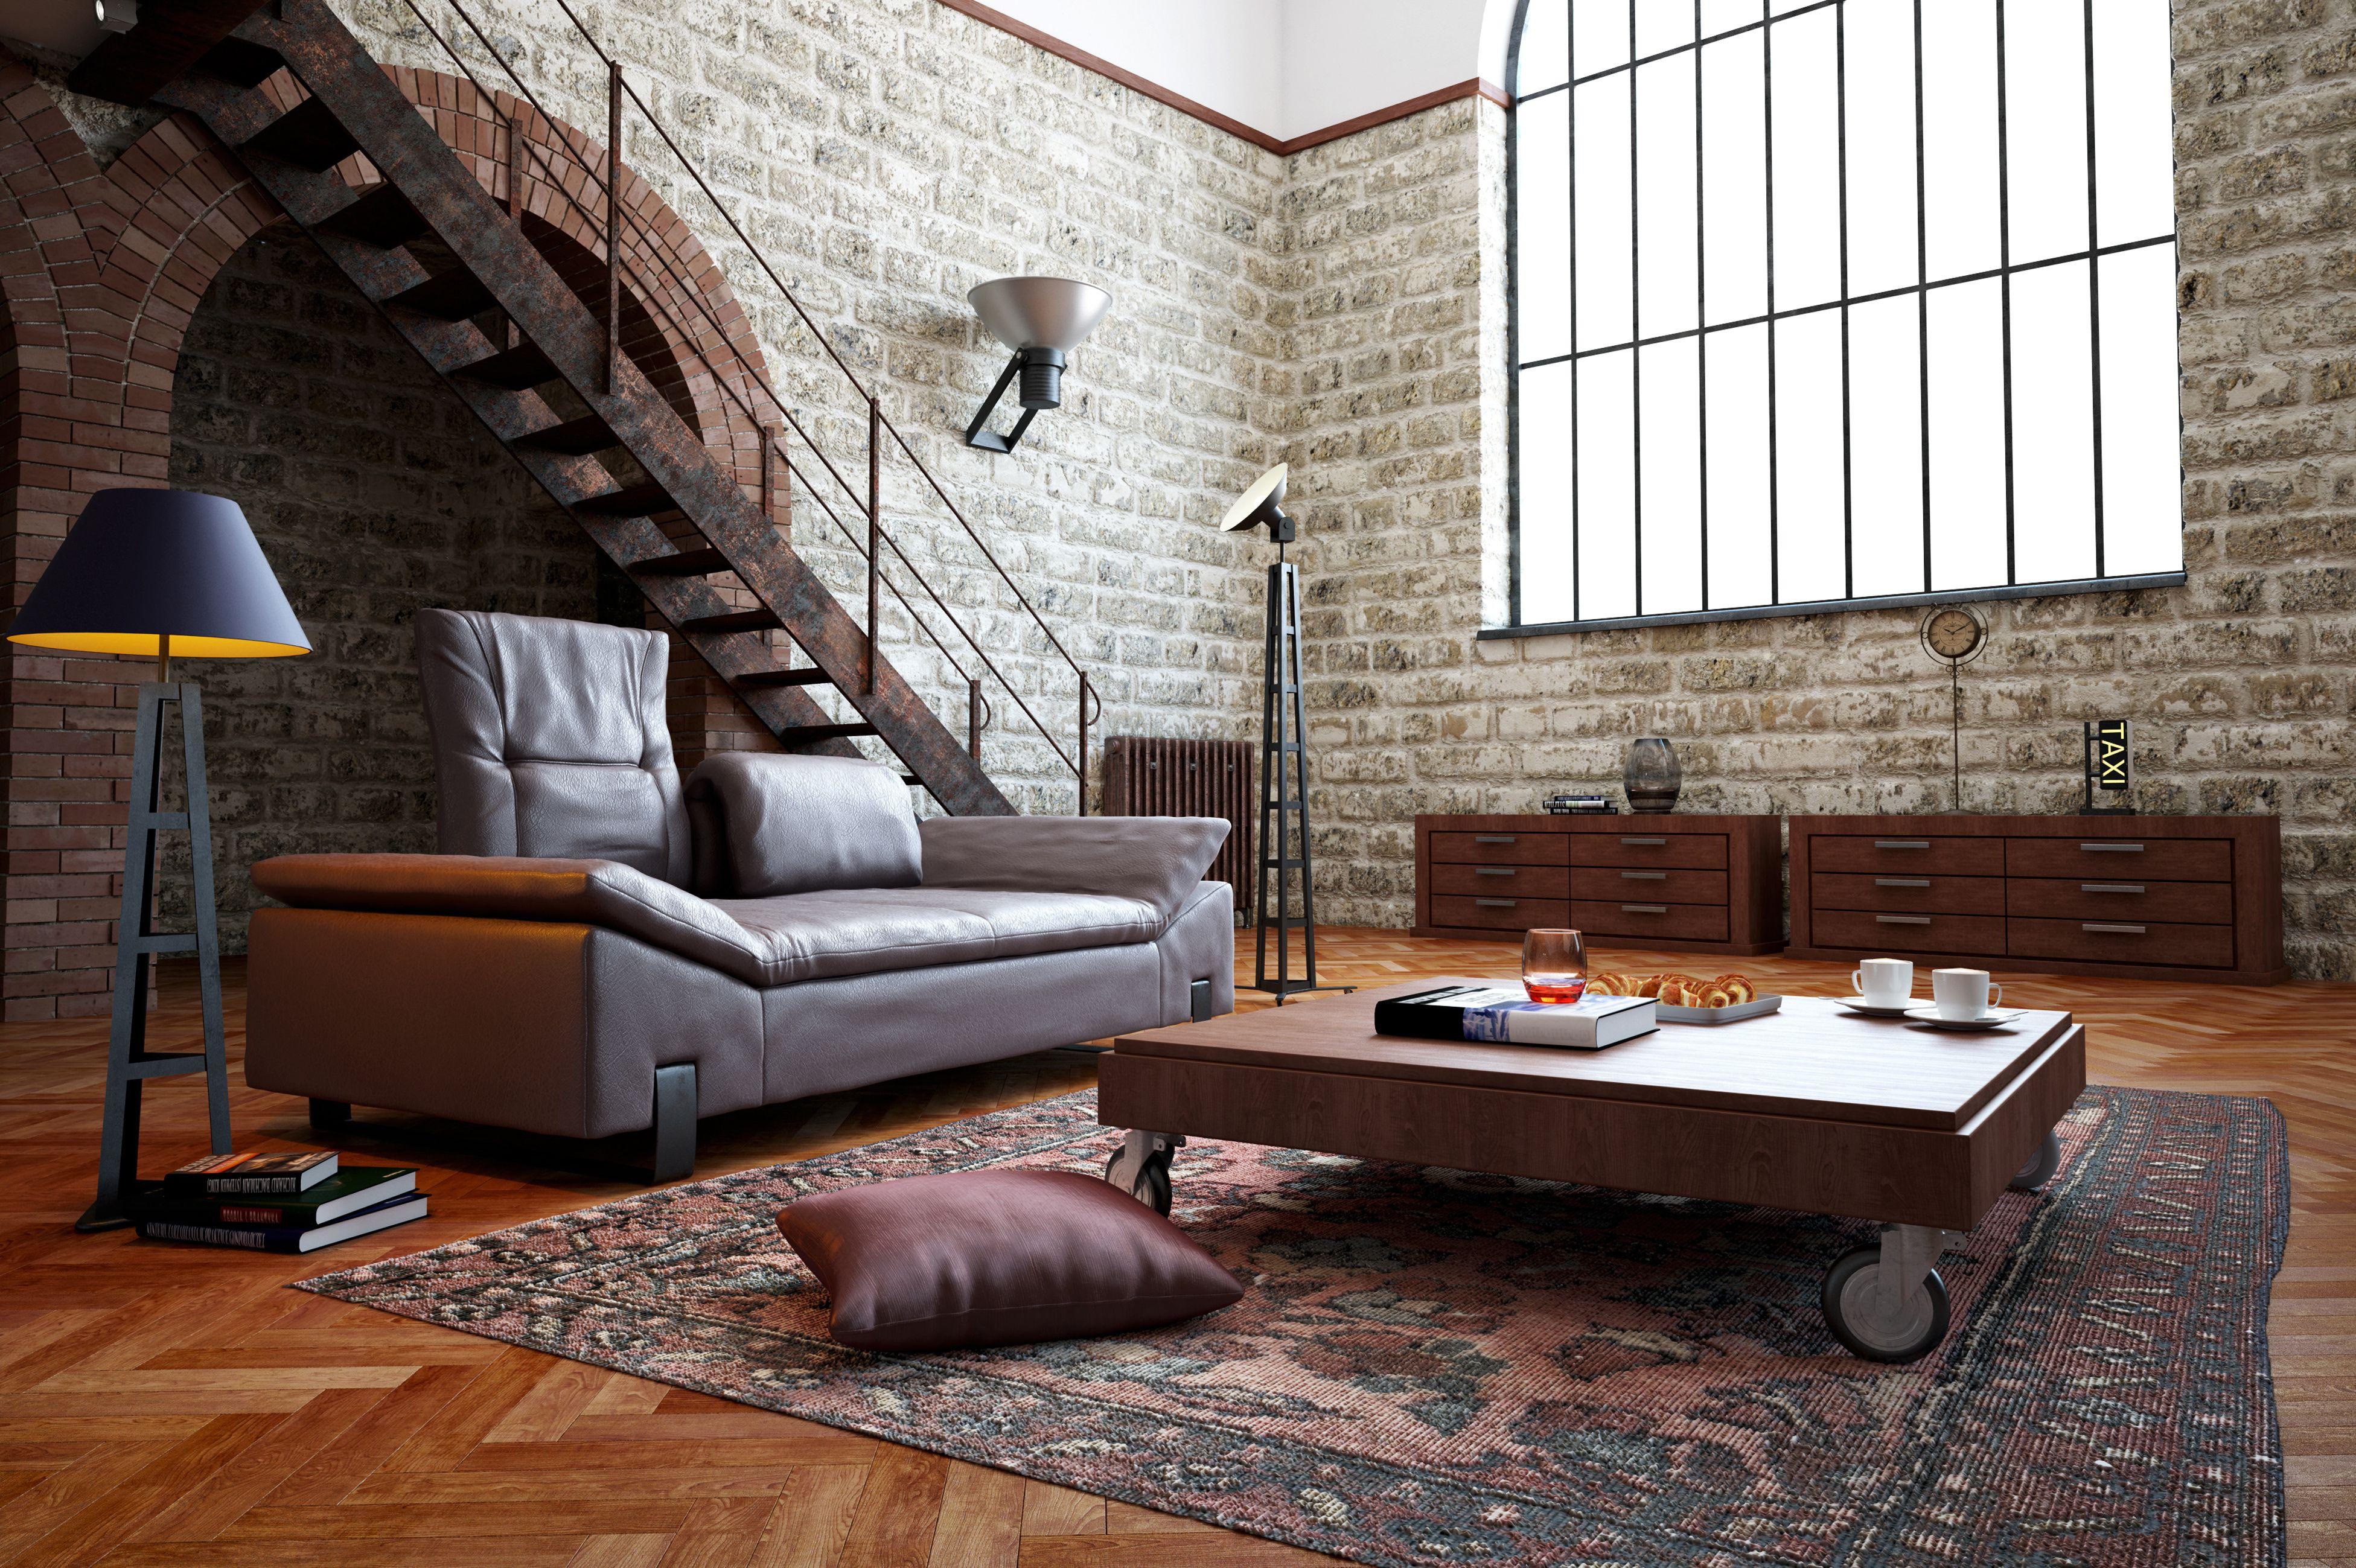 Interieur Mit Rustikalen Akzenten Loft Design Bilder: Schwarzen Akzenten